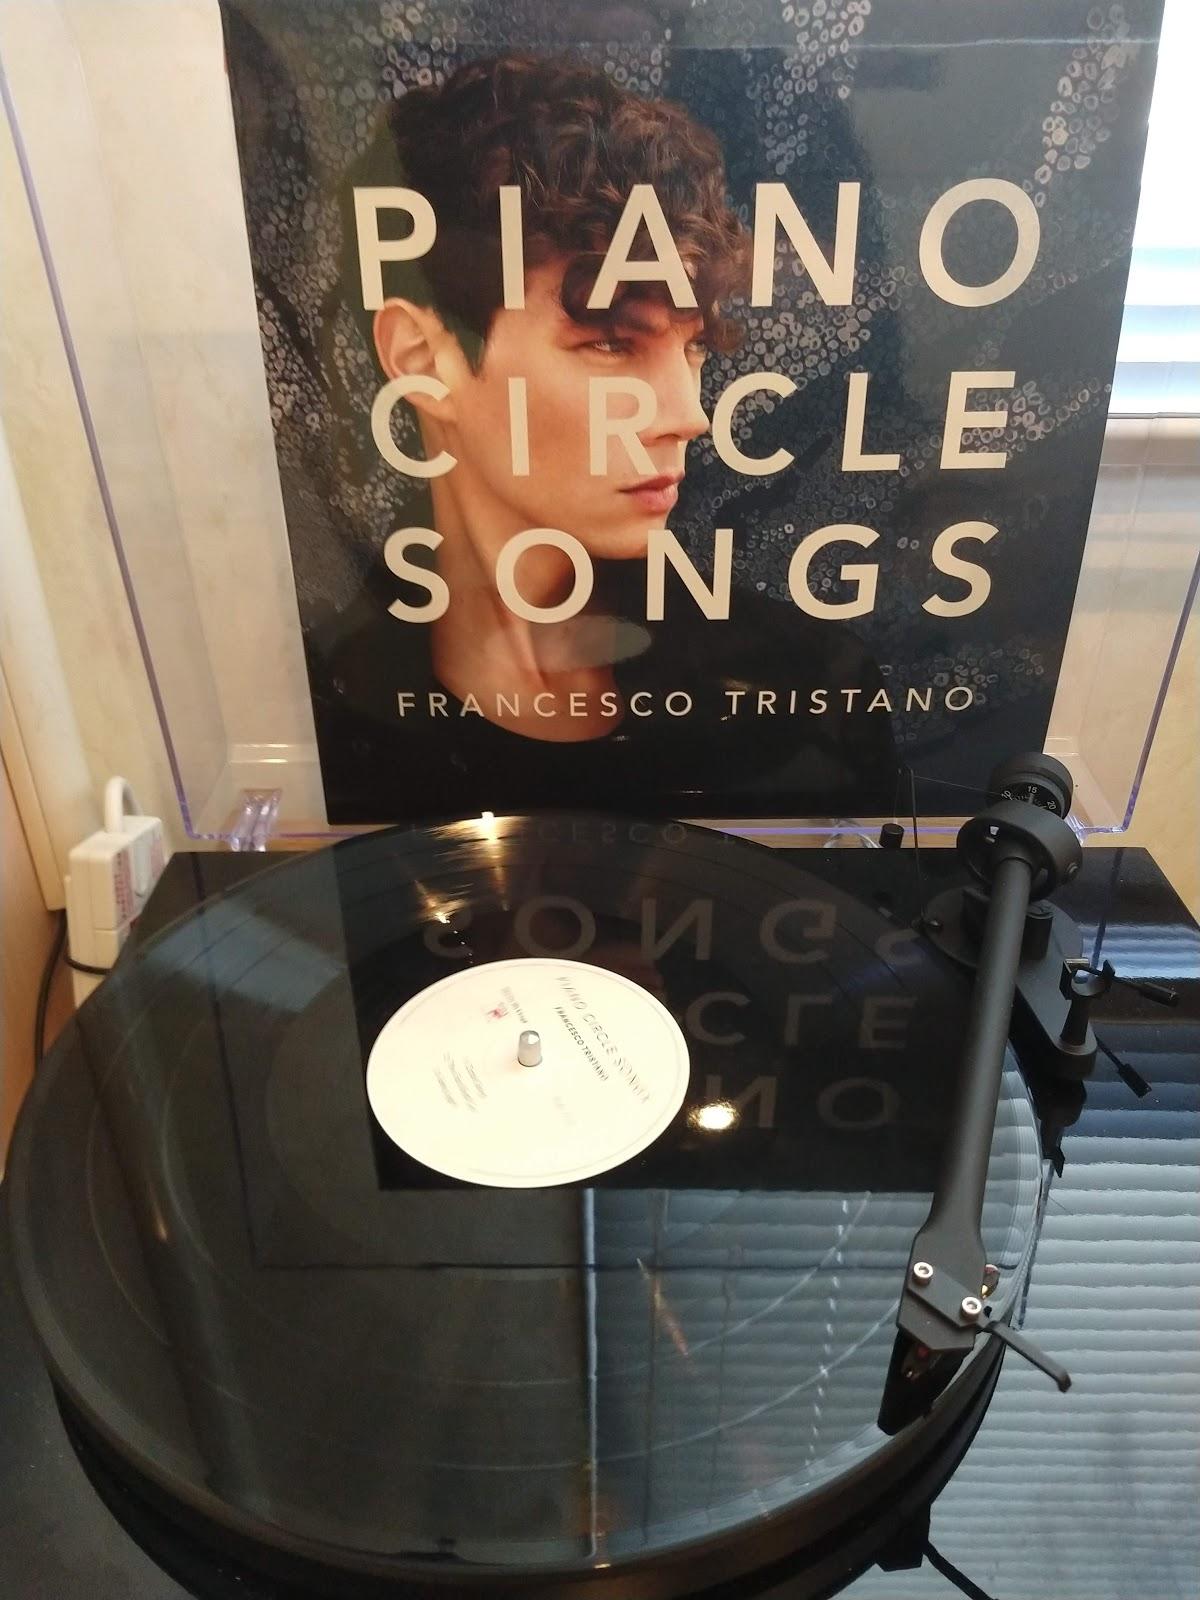 Ted's Salmagundi: Francesco Tristano - Piano Circle Songs